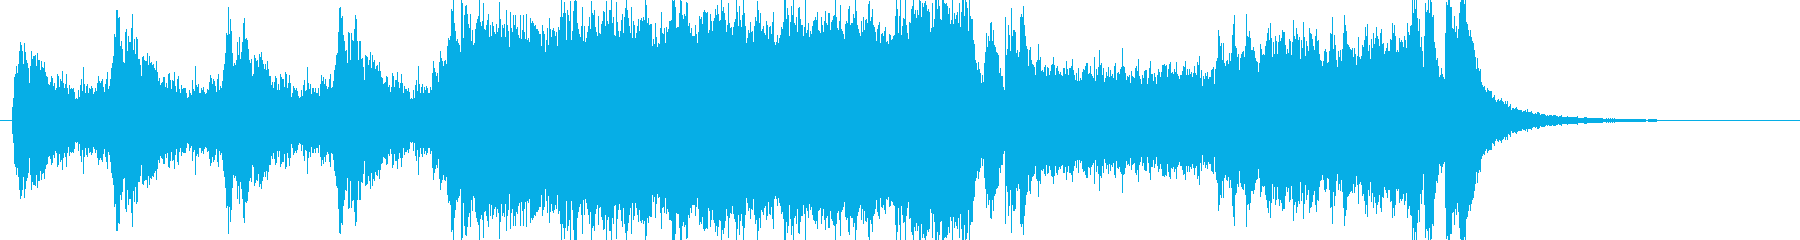 Opening Orchestraの再生済みの波形